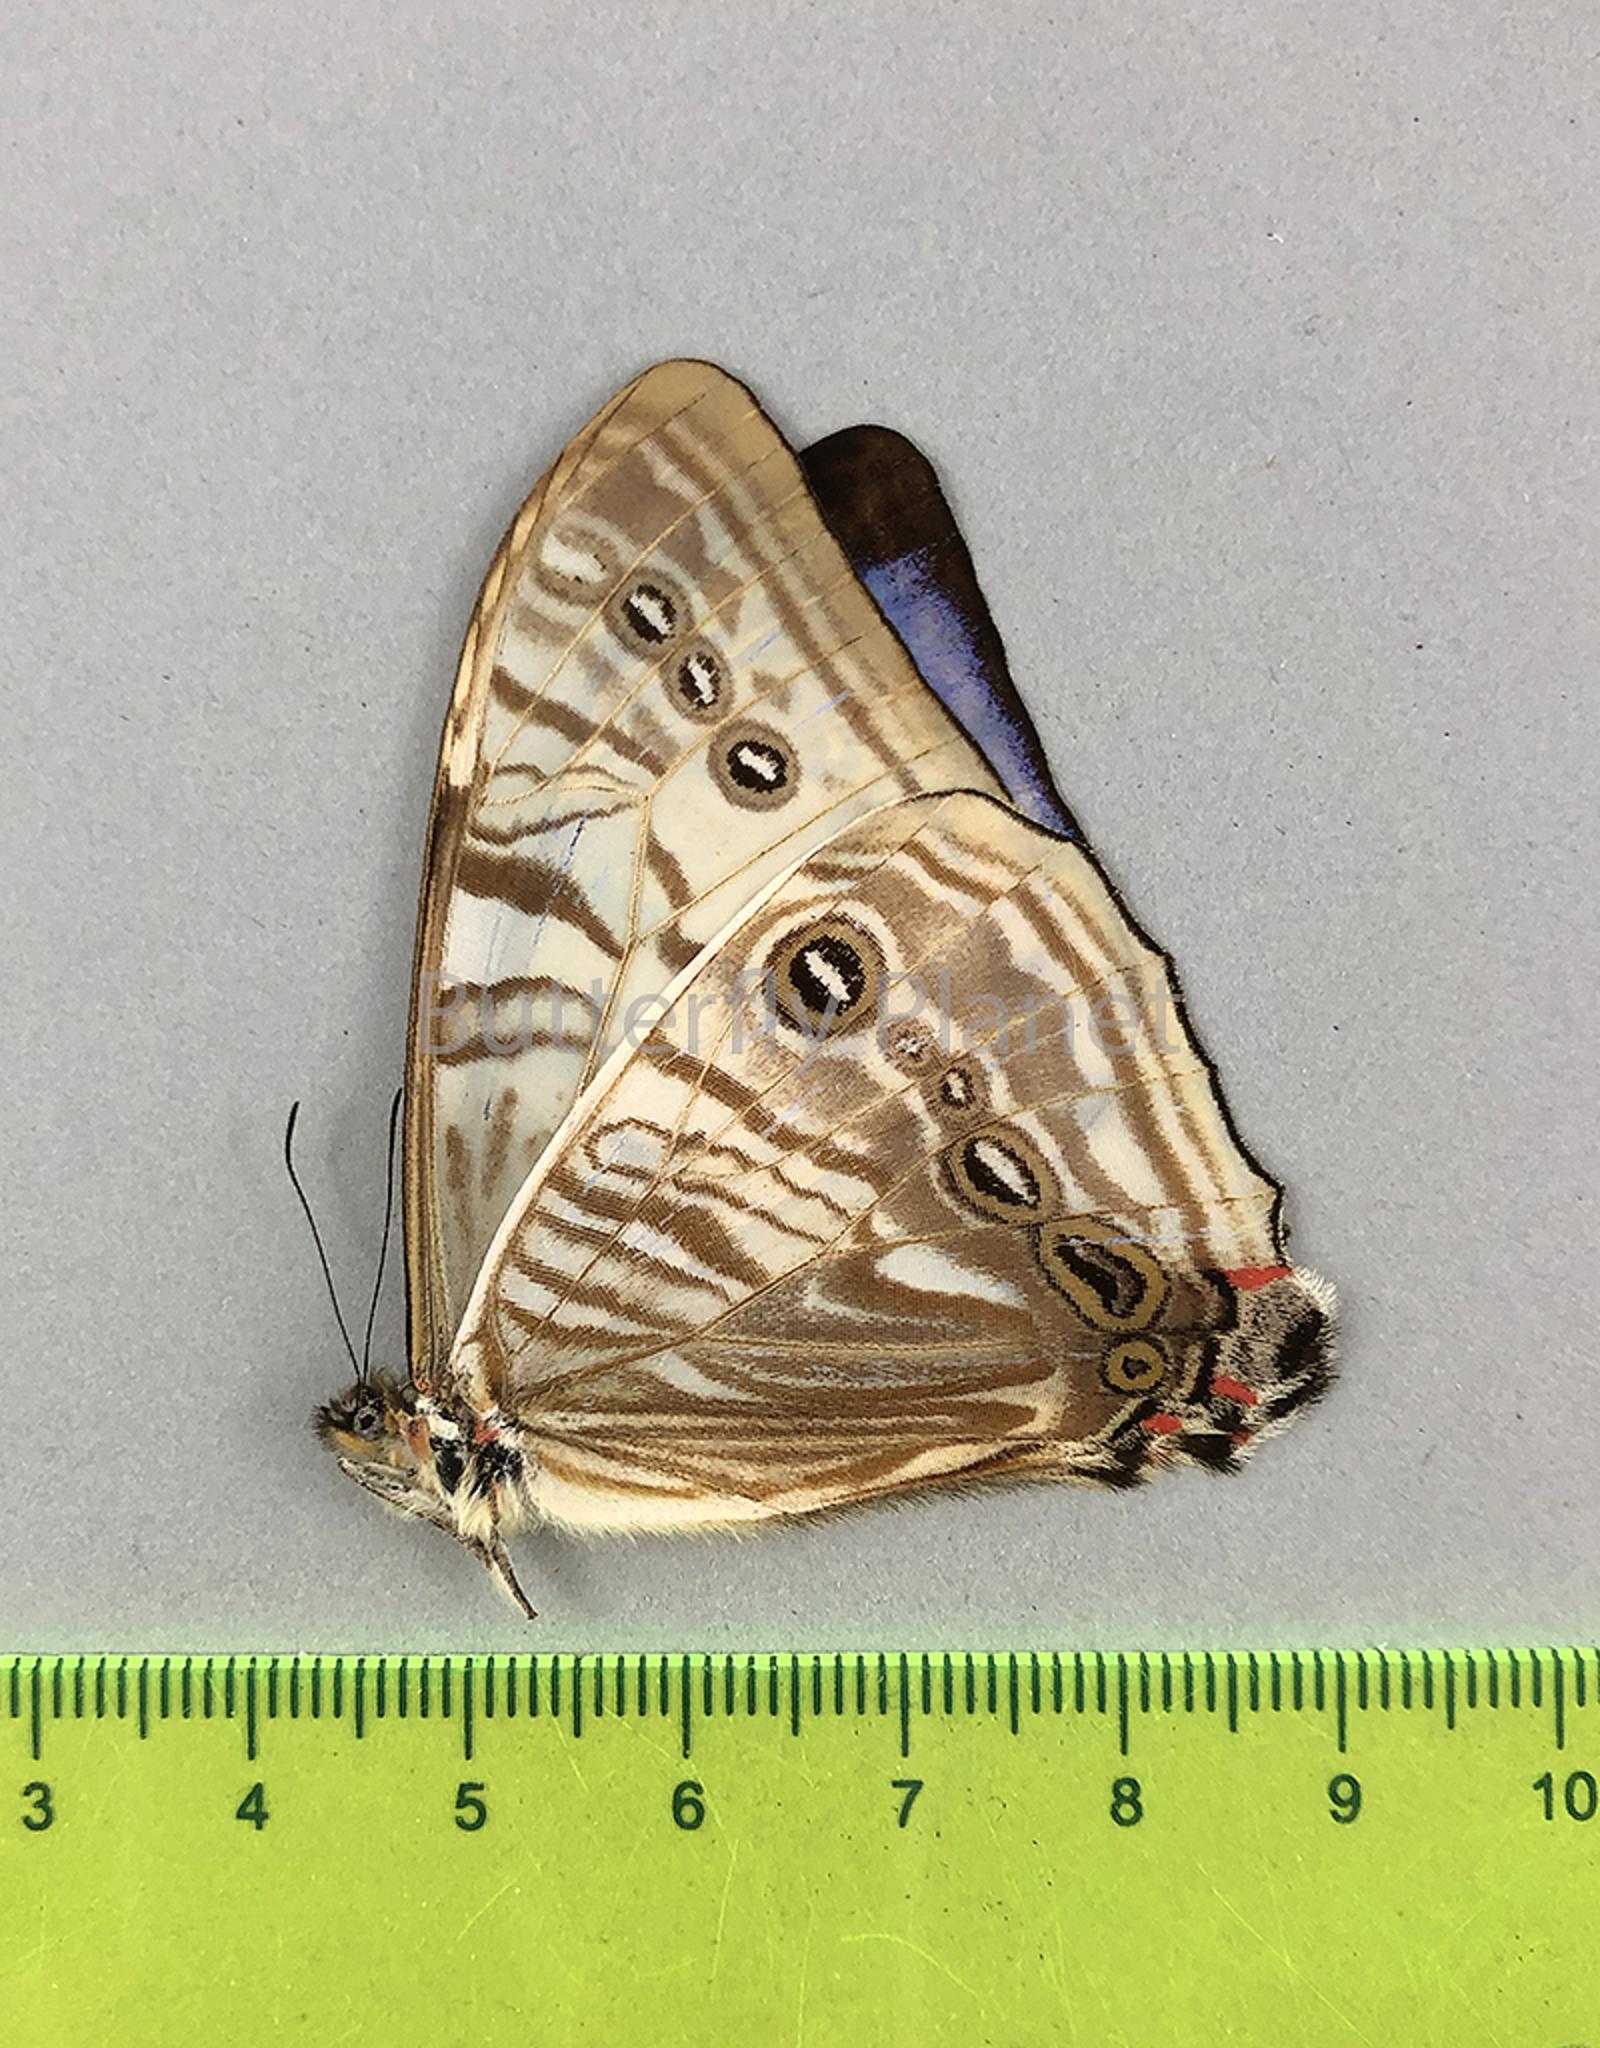 Morpho sulkowskyi descimokoenigi M A1 Peru